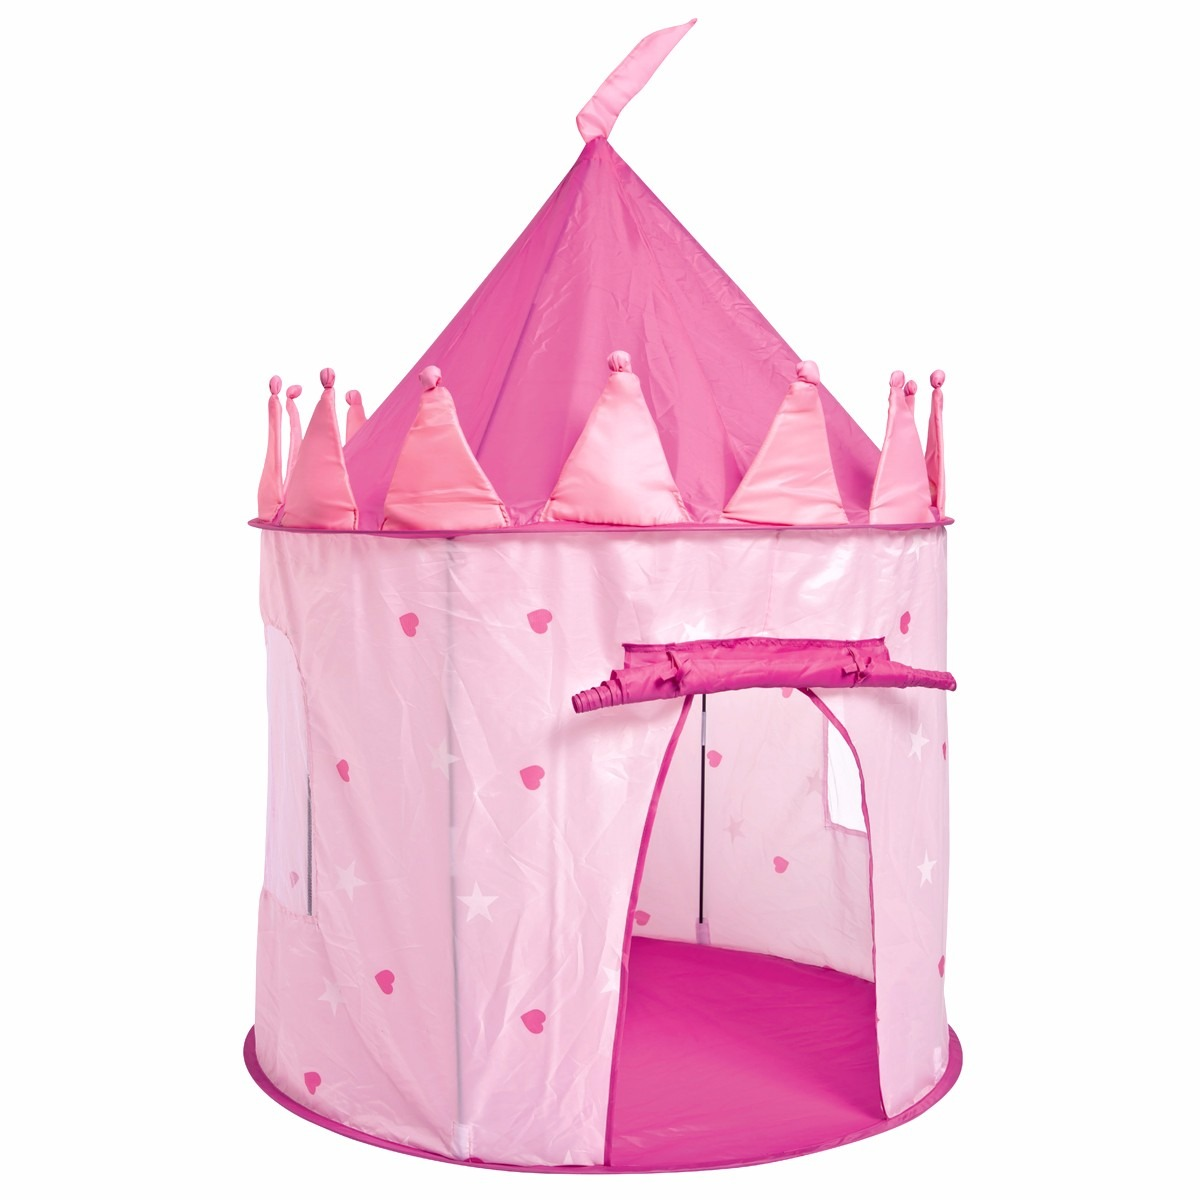 Juguete Niñas De Para Casa Princesas Castillo Casita lJK3FTcu1